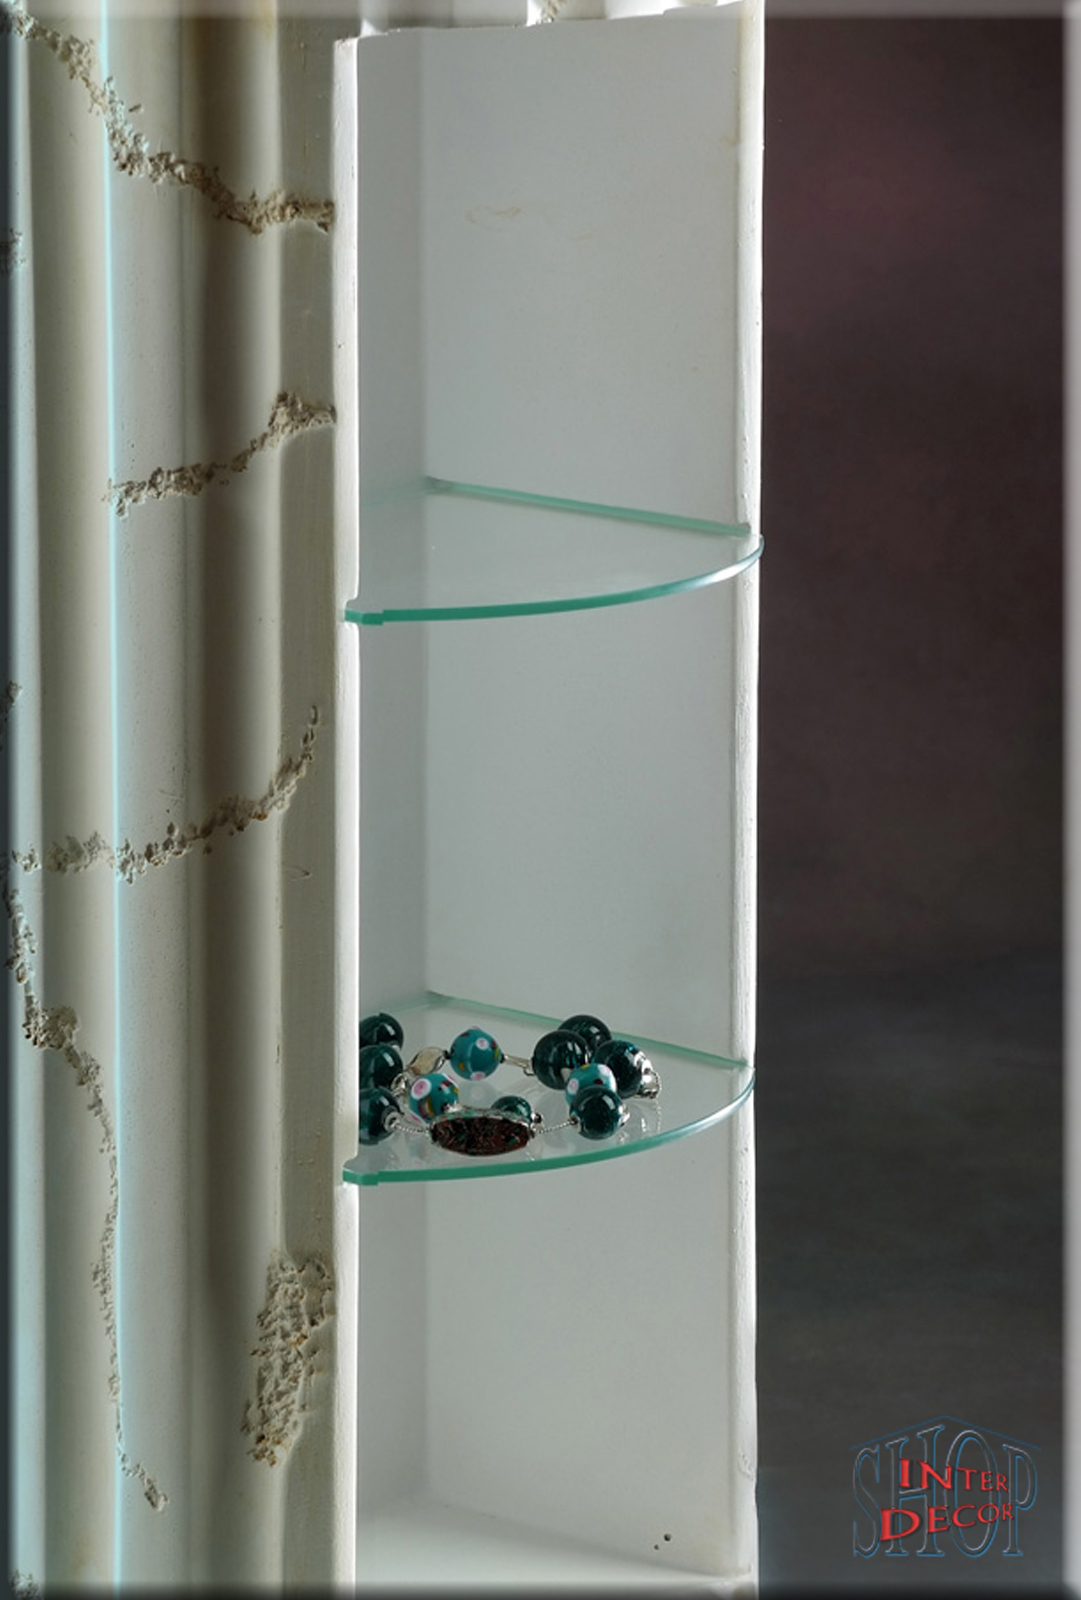 griechischer cd regal s ule s ulenregal regal vitrine cd st nder ebay. Black Bedroom Furniture Sets. Home Design Ideas